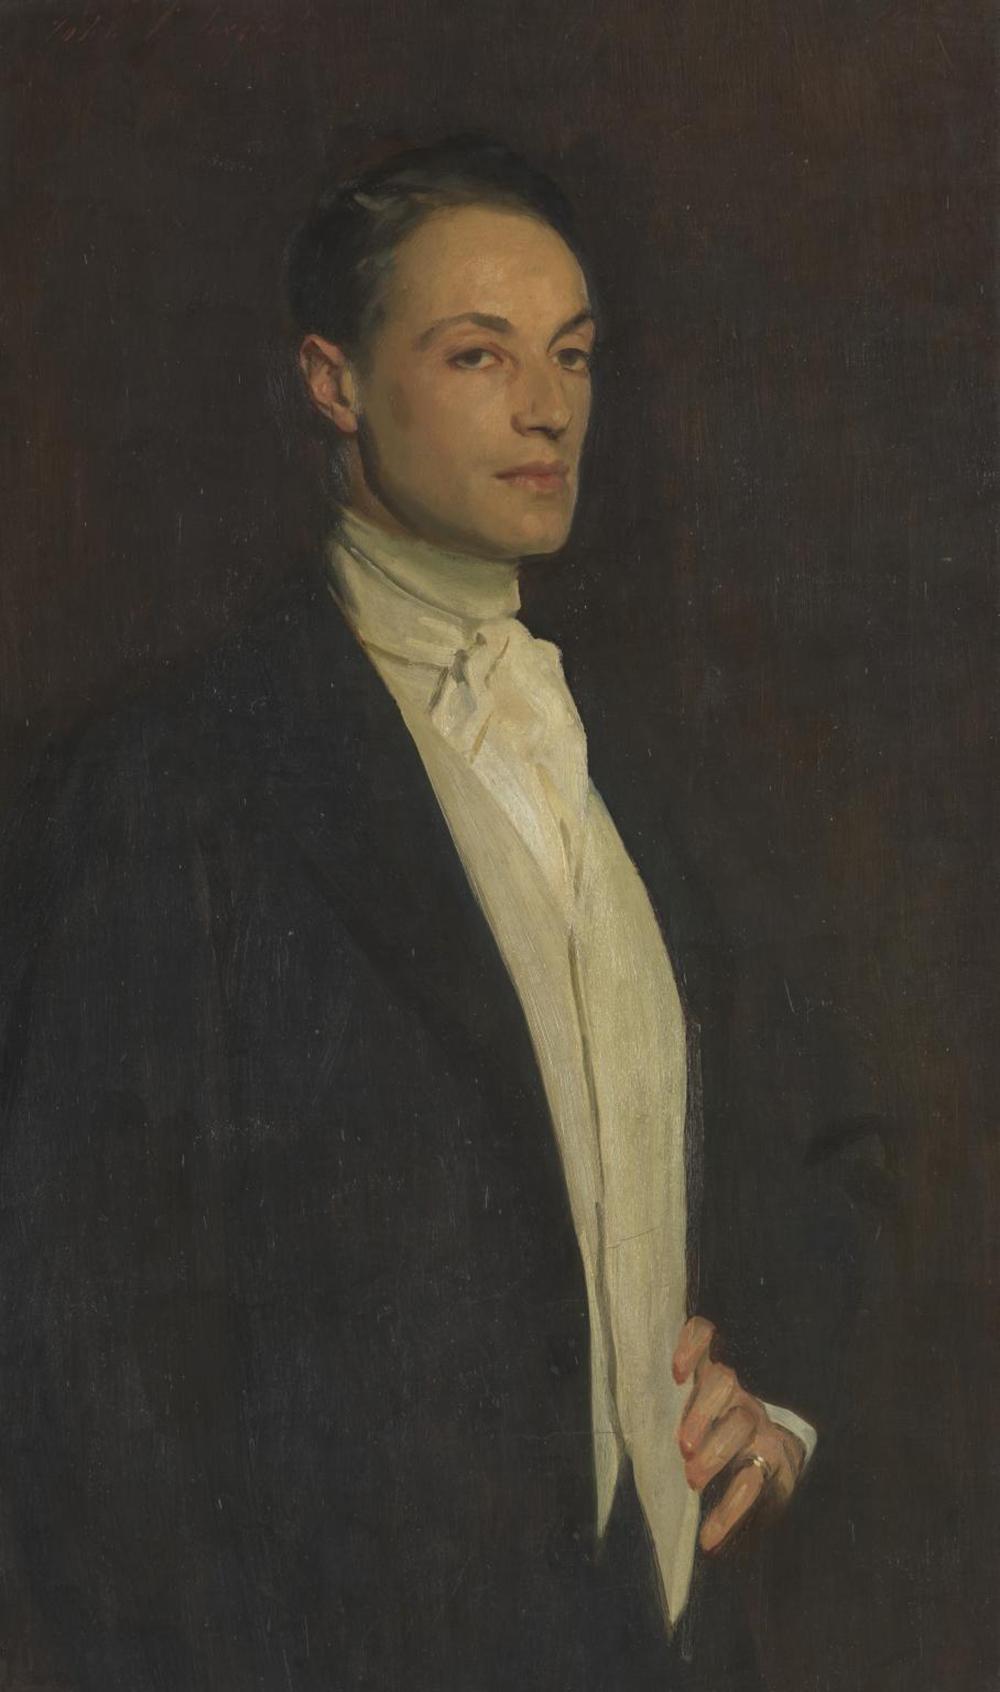 Sir Philip Sassoon, by John Singer Sargent, 1923.